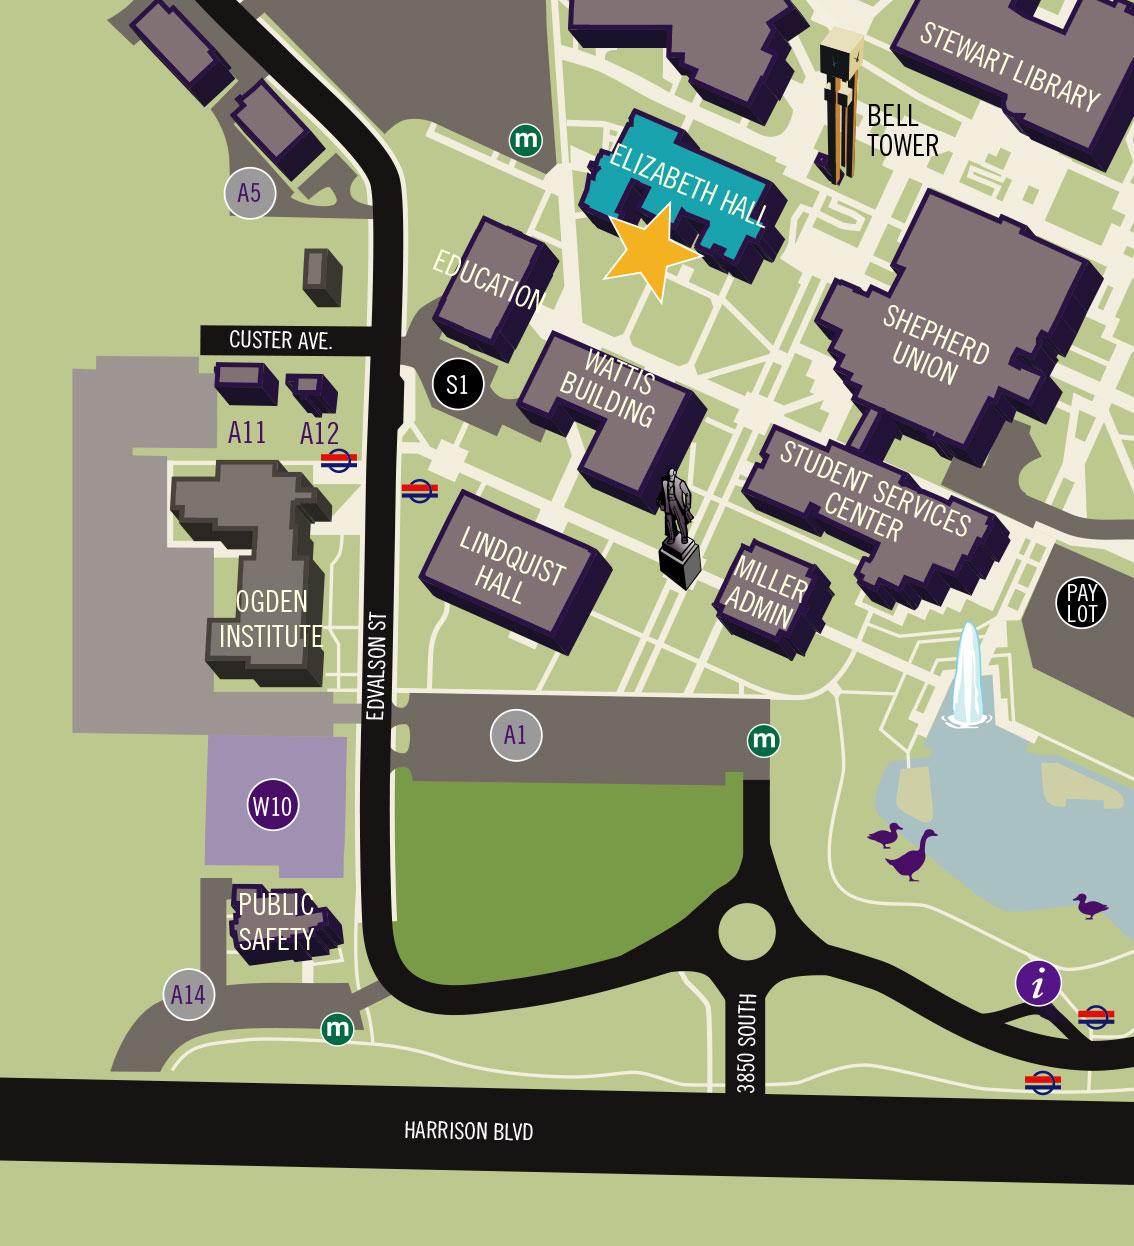 campus map showing location of Elizabeth Hall